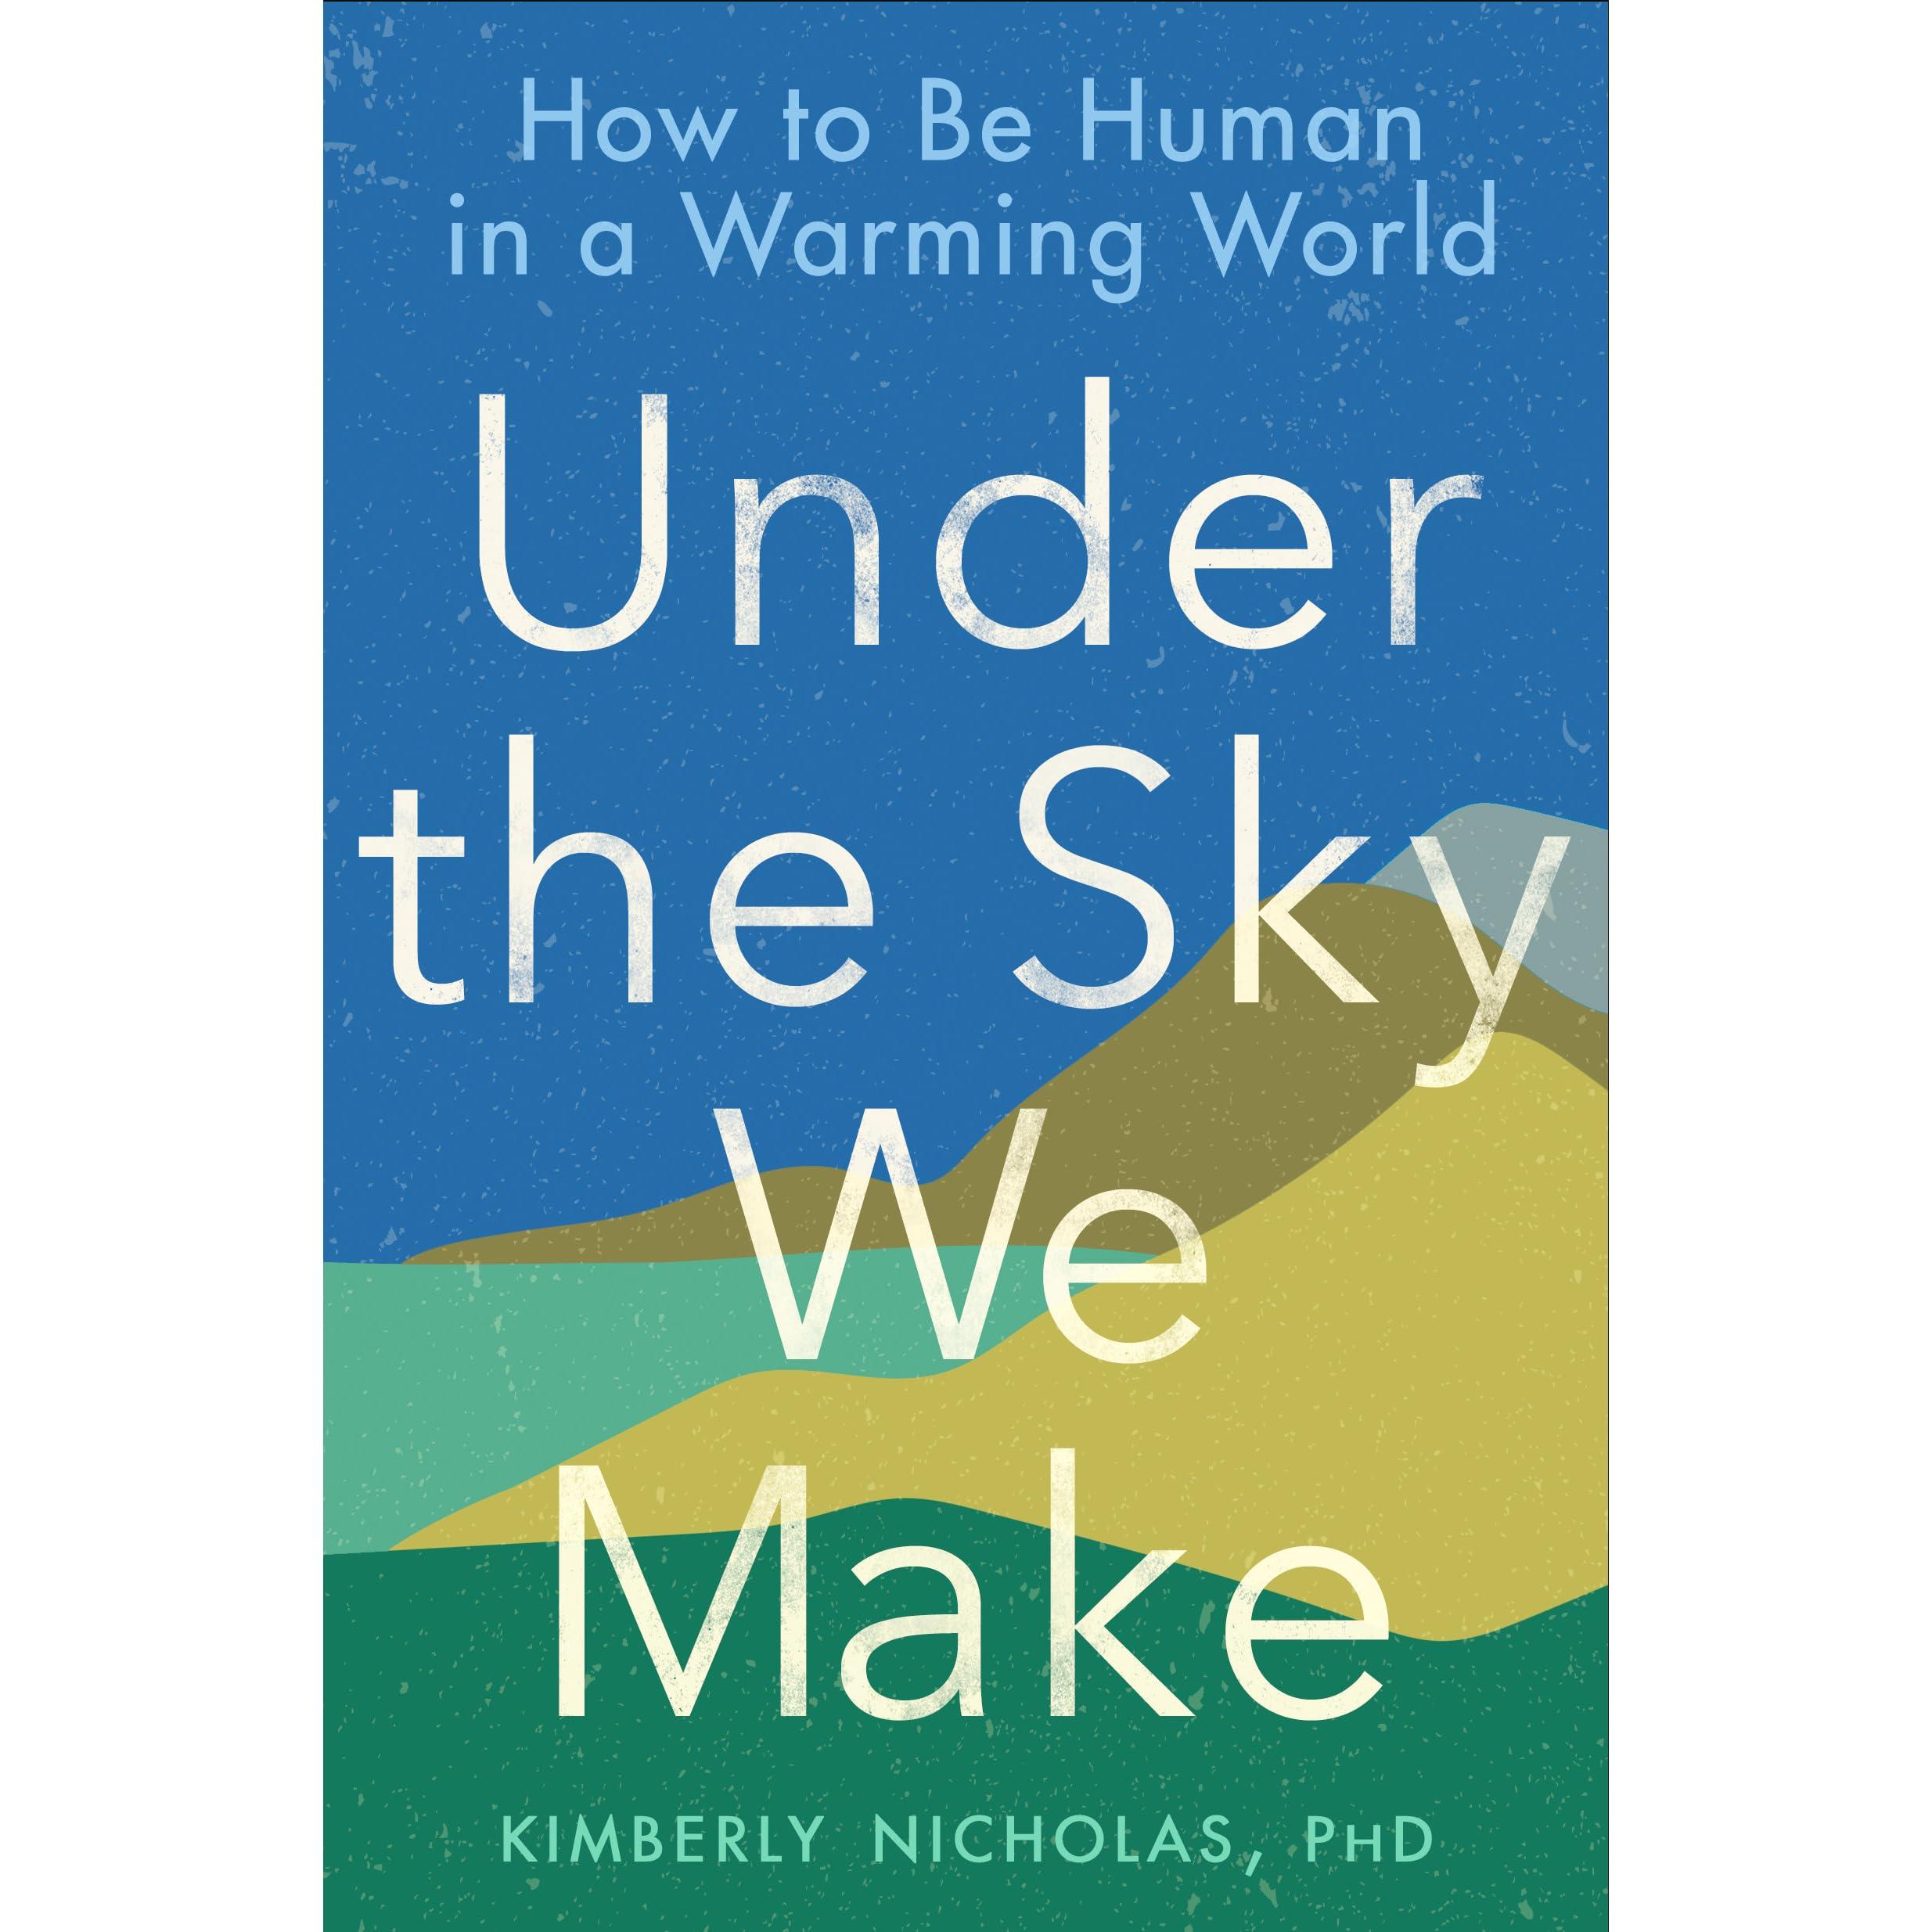 Under The Sky We Make Kimberly Nicholas Phd